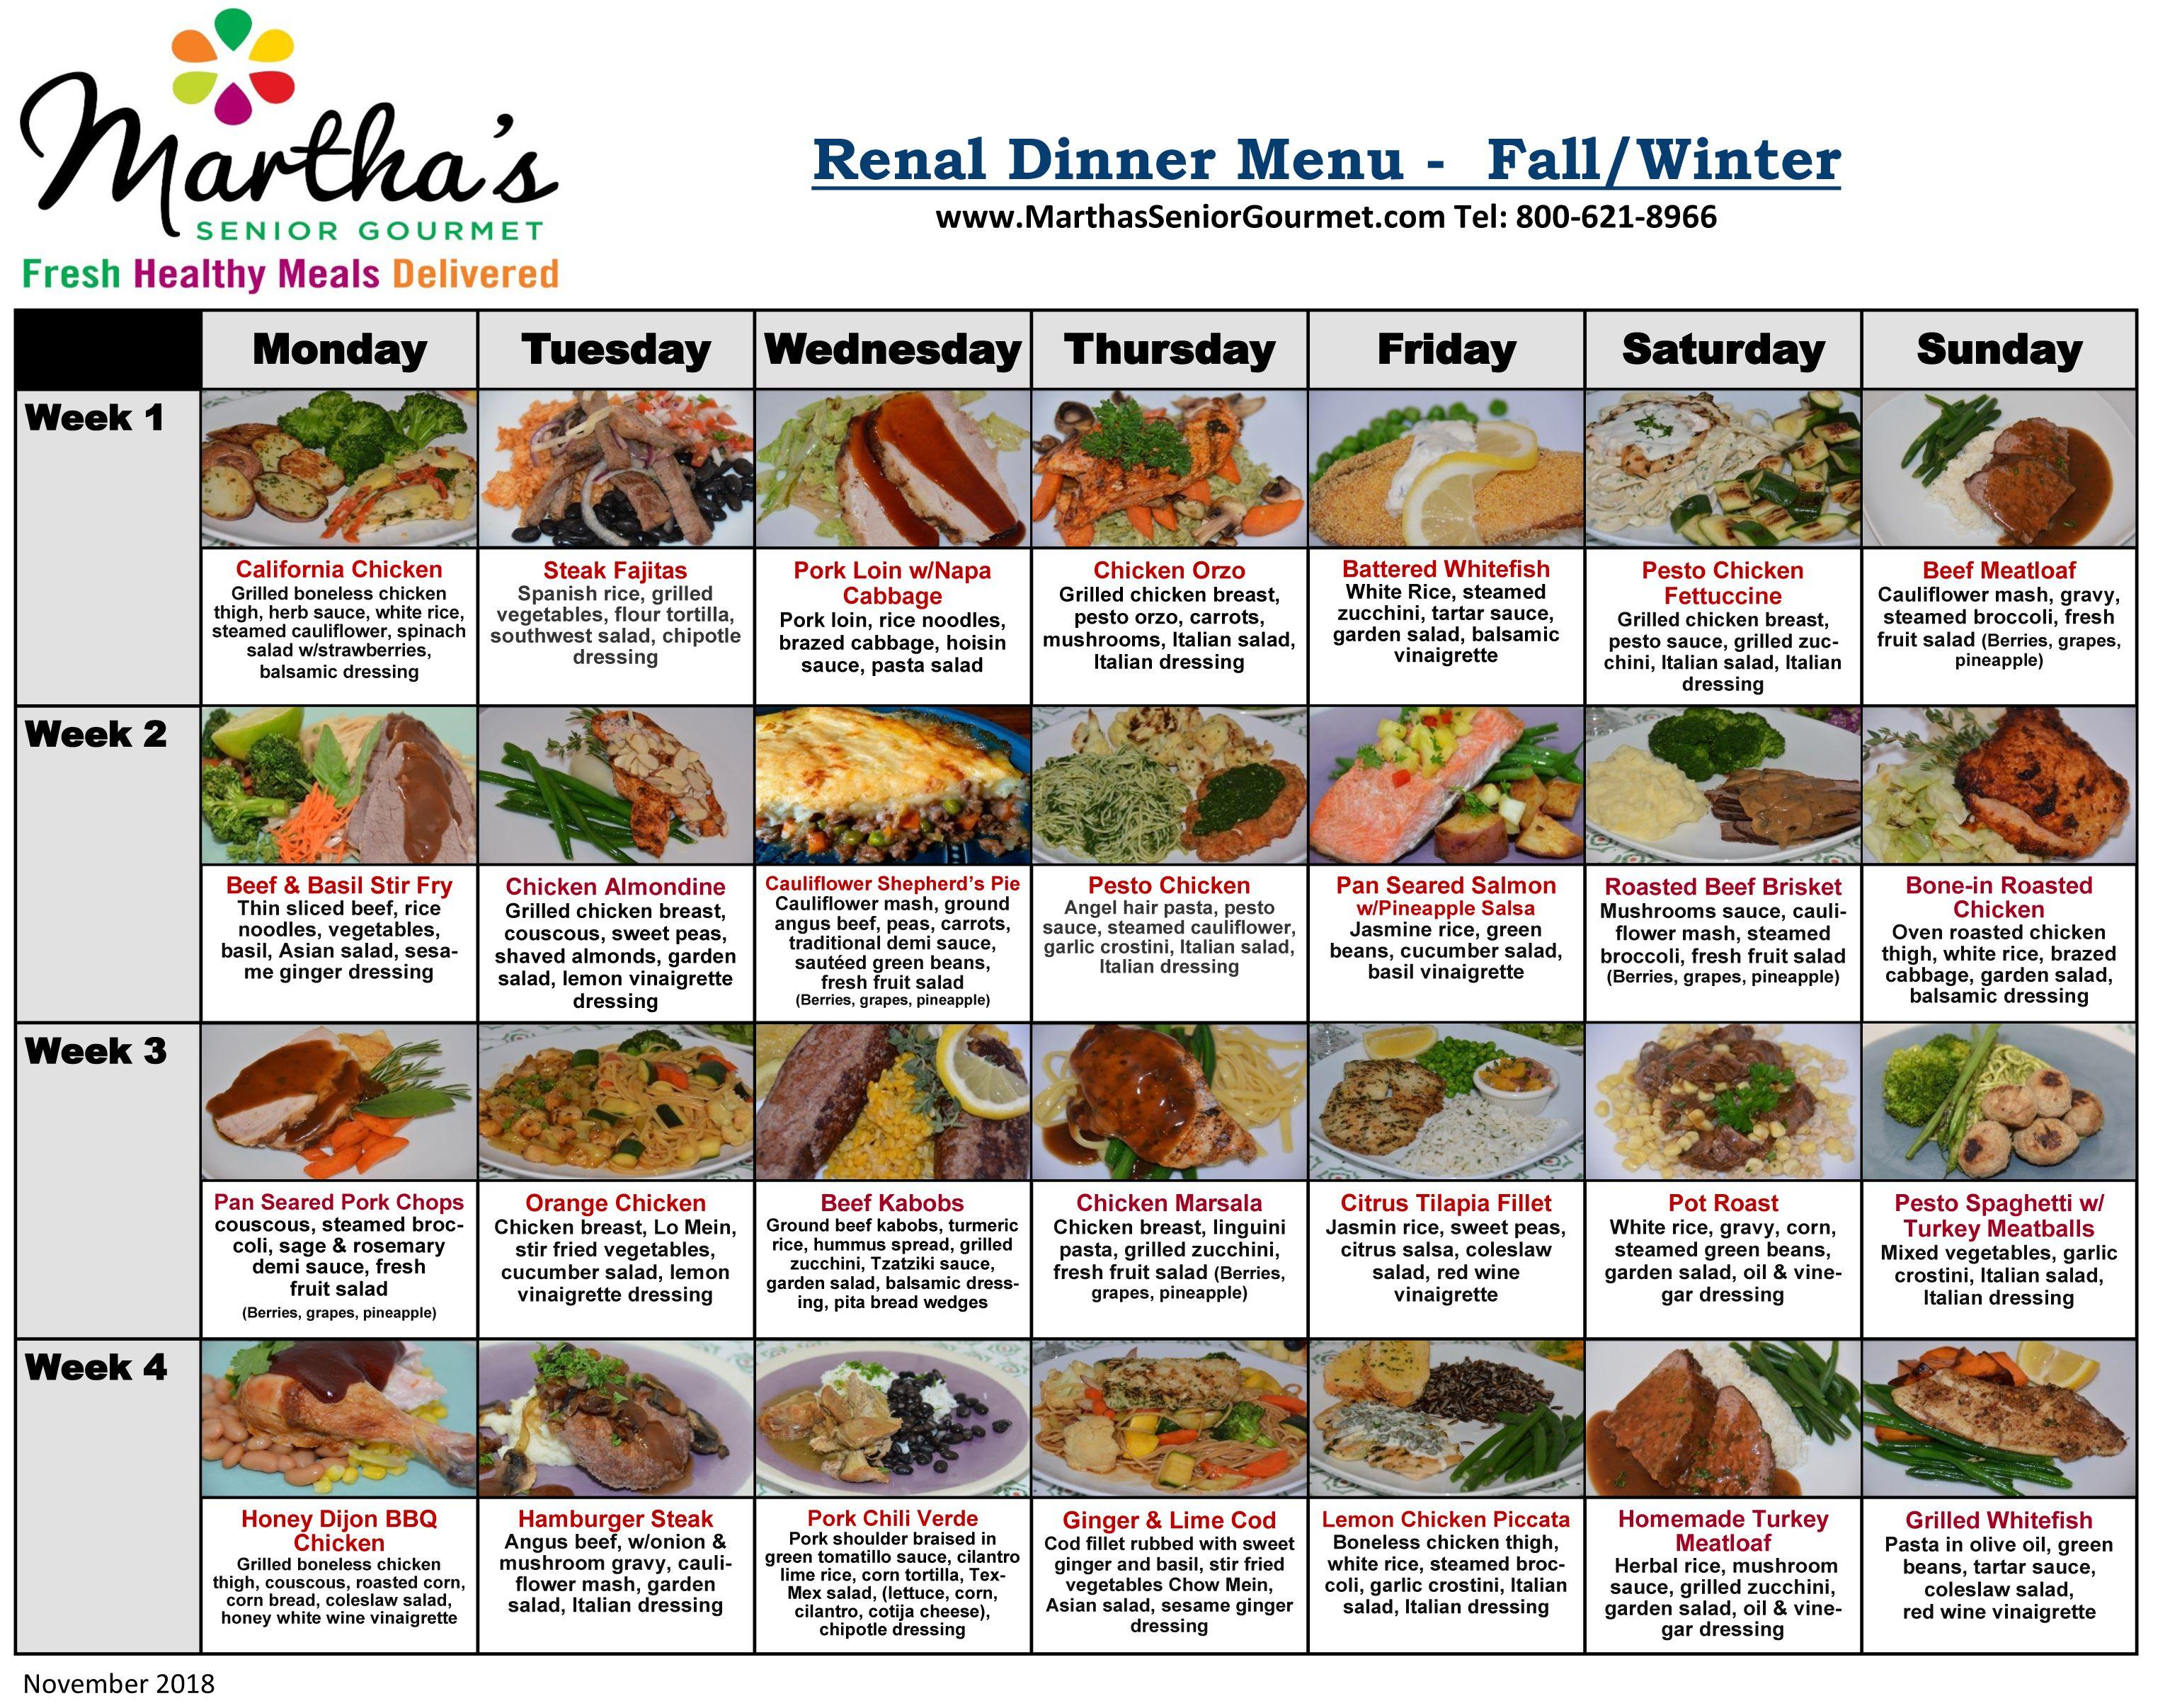 Renal Diet   Renal diet recipes Kidney friendly foods